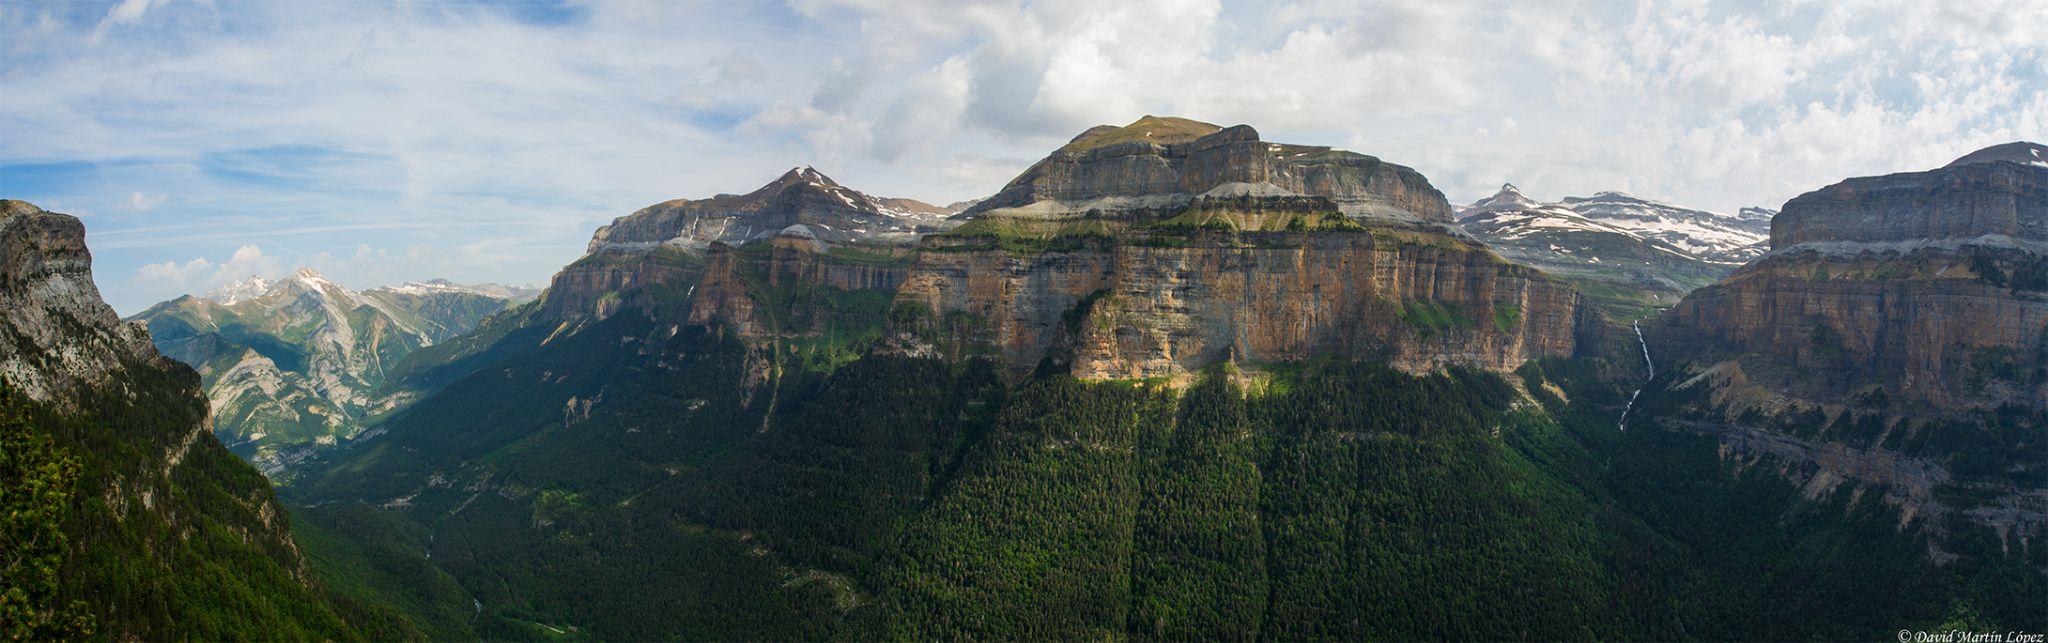 Ordesa's mountains by davidmartinlopez